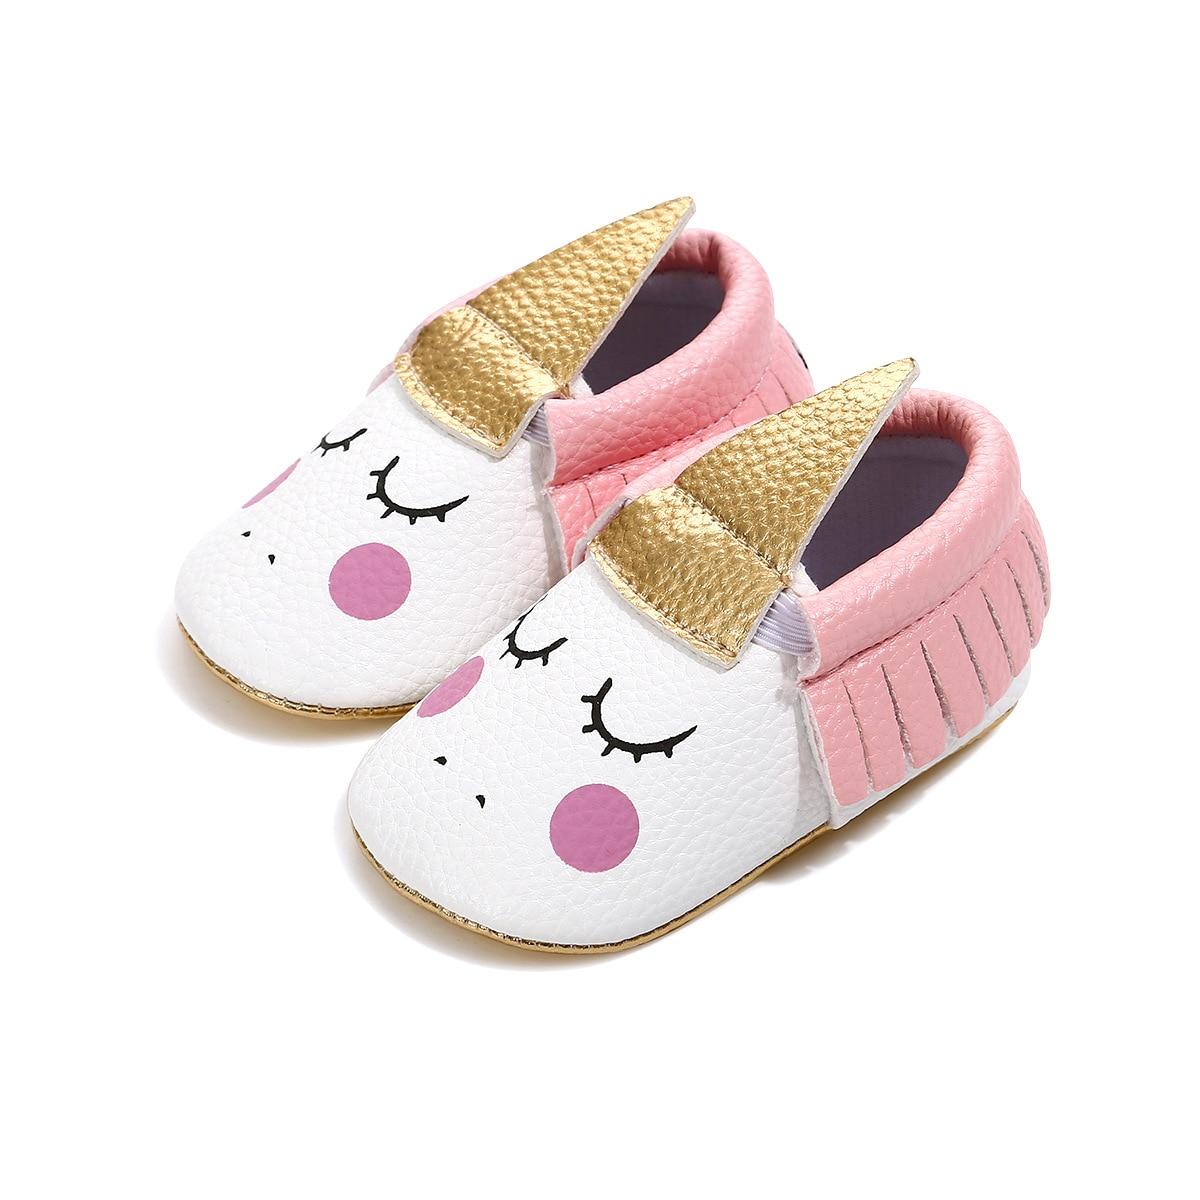 Unicorn Baby Girl Leather Crib Shoes Newborn Non-slip Soft Sole Tassel Prewalker